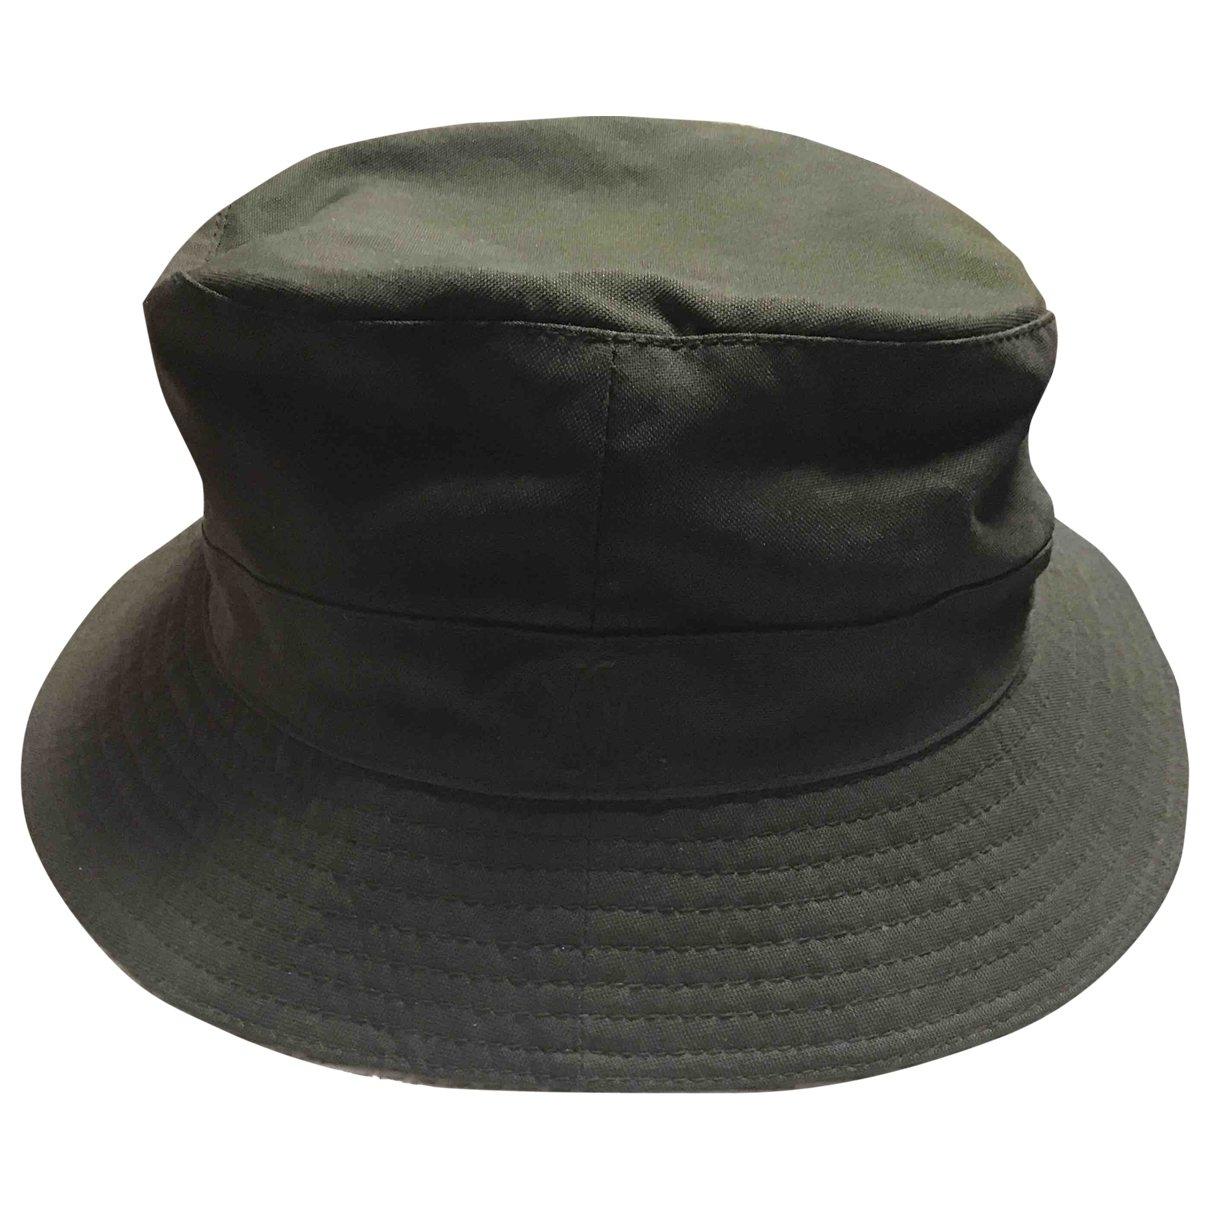 Hermès \N Green hat for Women L International